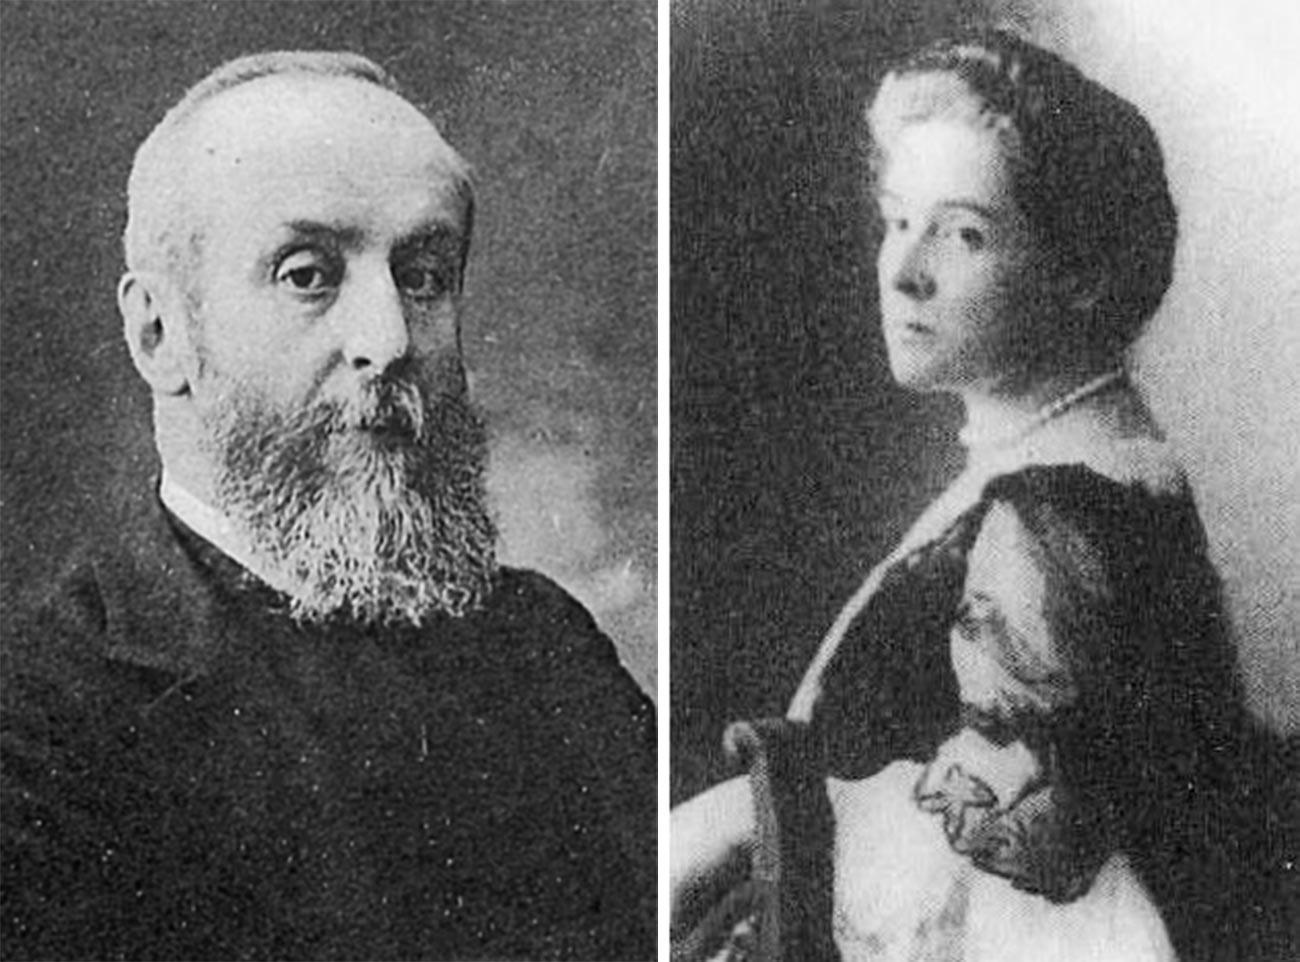 Alexander Bobrinski und Nadeschda Bobrinskaja, Sophias Eltern